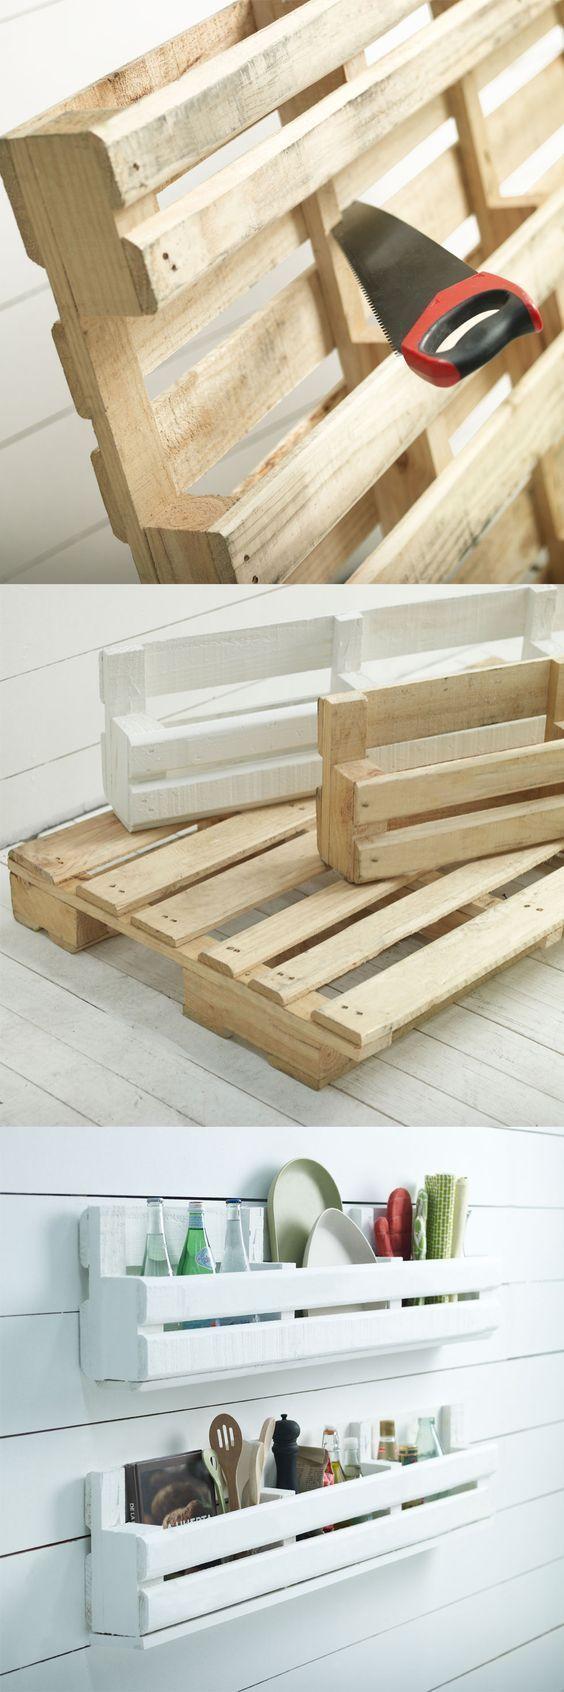 Muebles Reciclados Mueblesreciclados Muebles Reciclados  # Muebles Reiclados